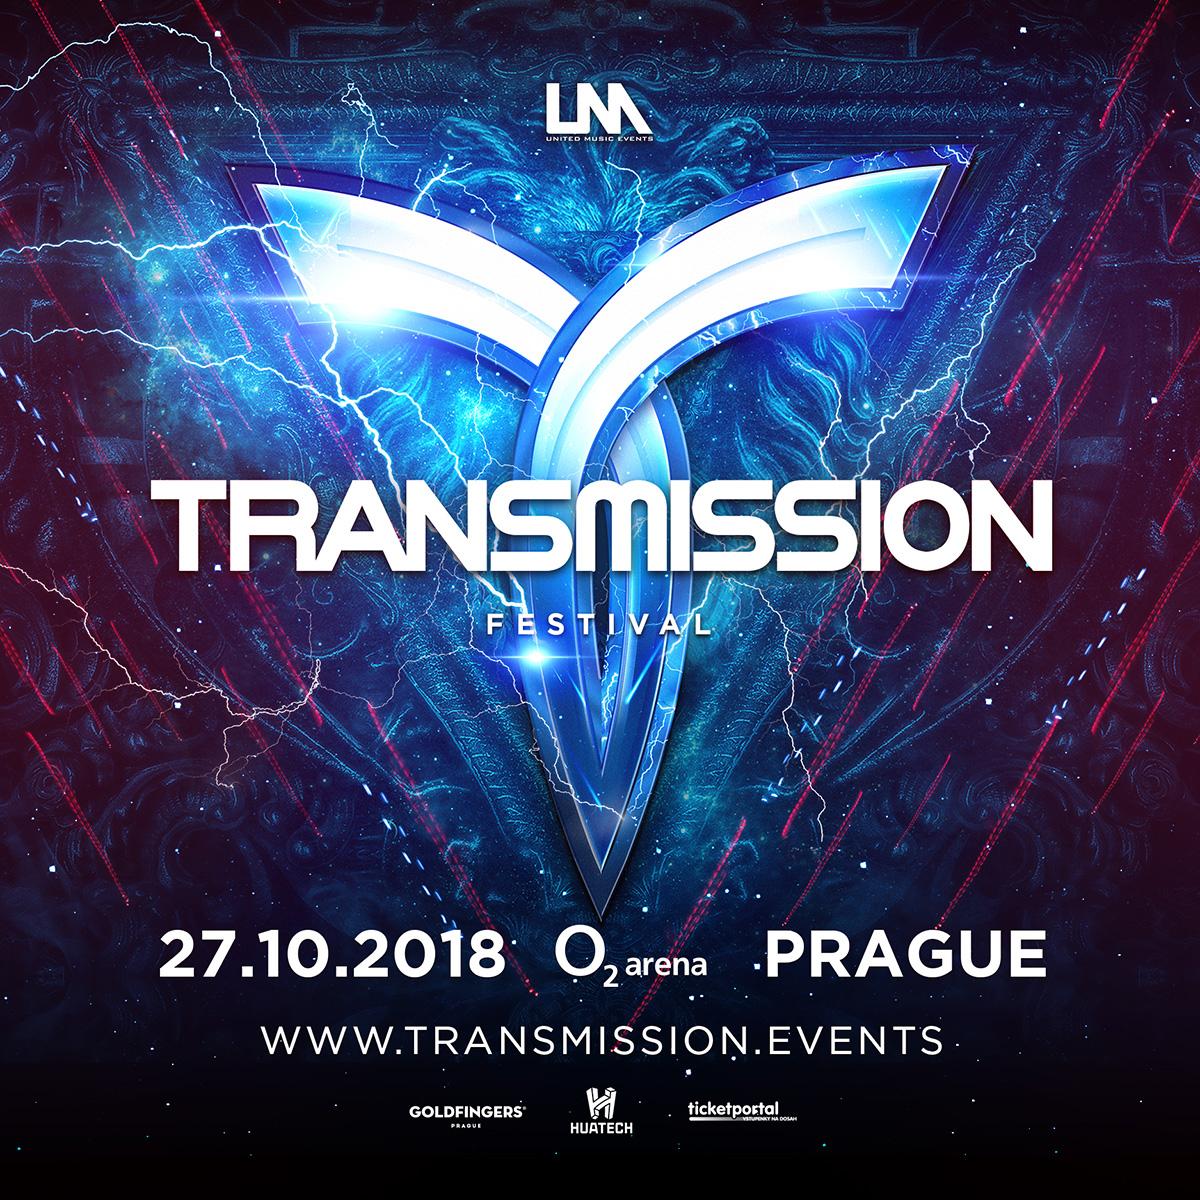 Partybus na Transmission 27.10.2018